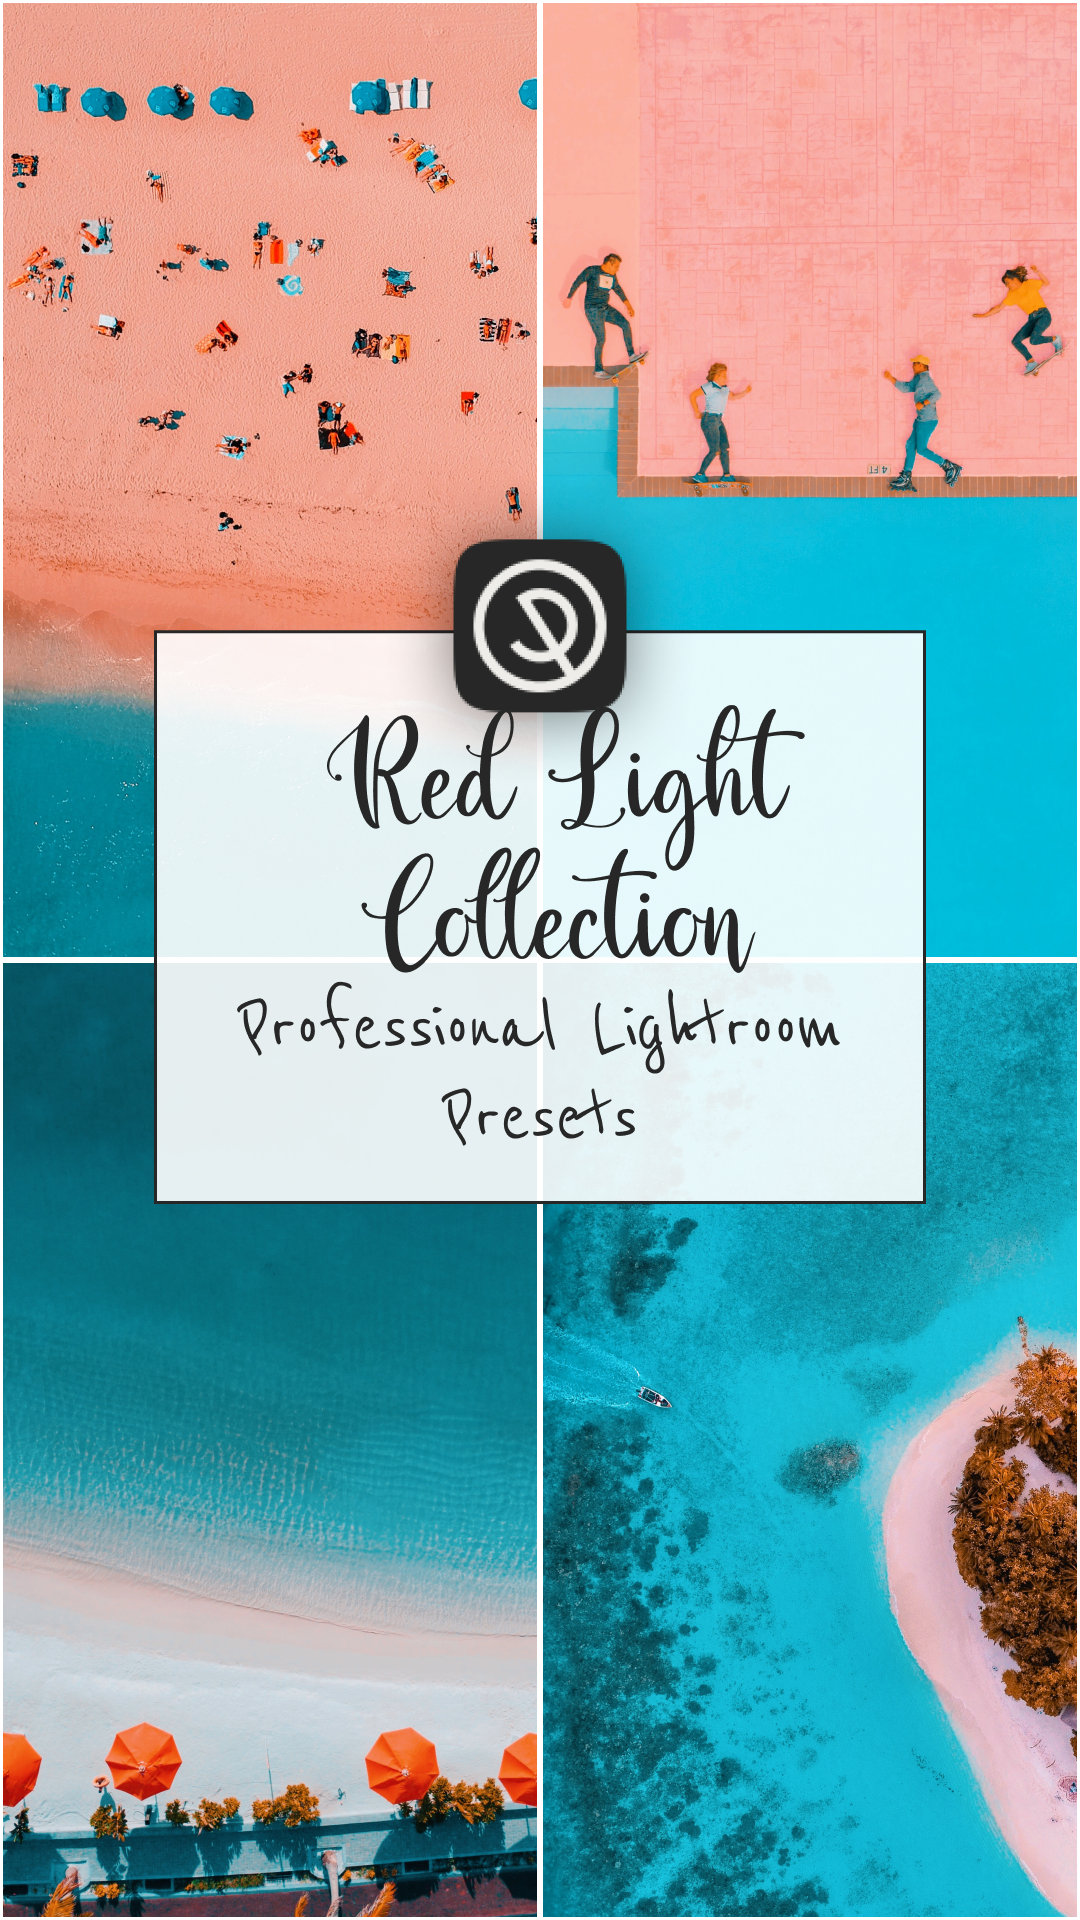 Share lightroom catalog